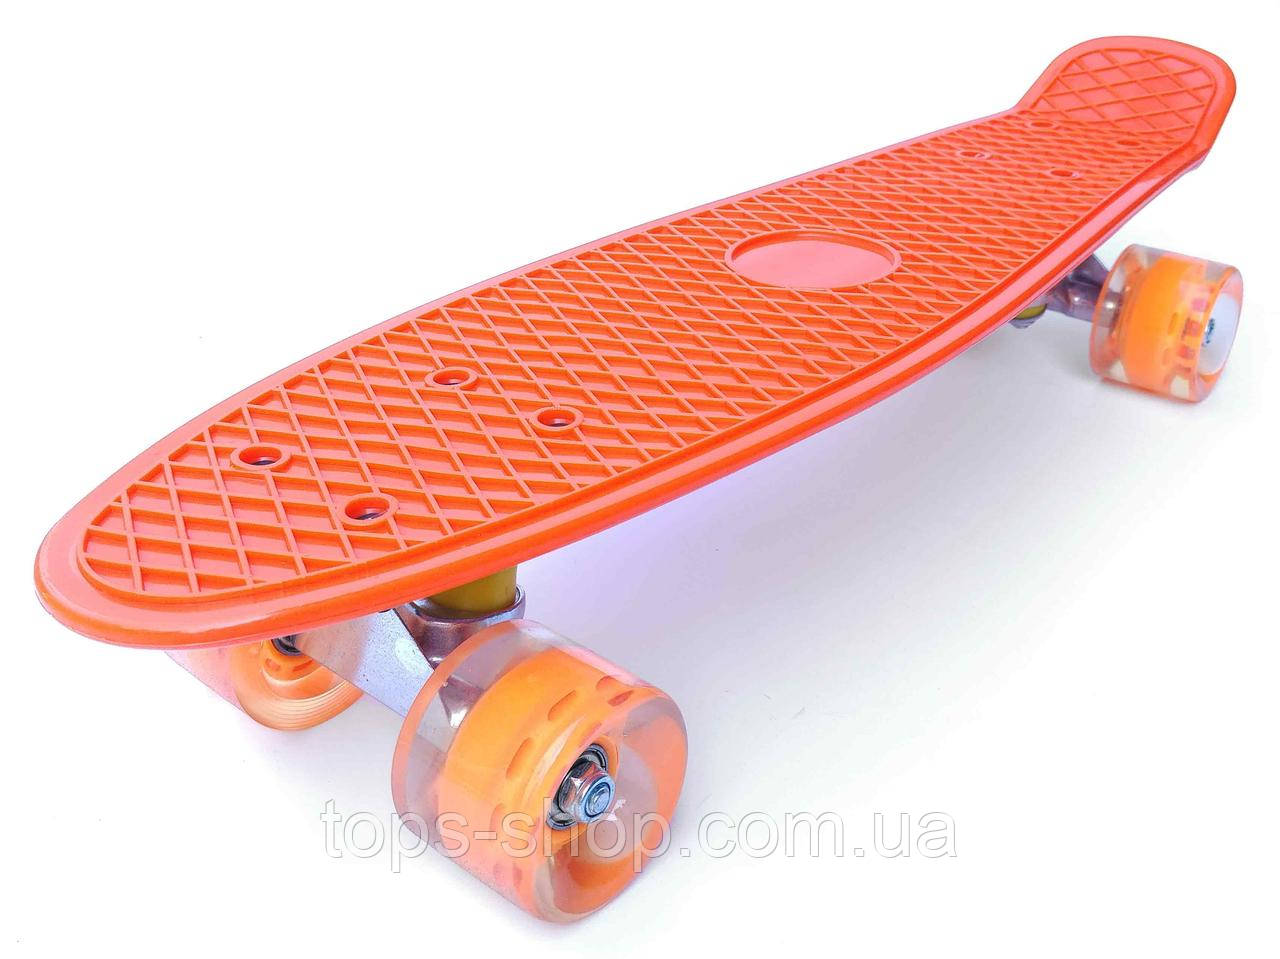 Скейт Penny Board, с широкими светящимися колесами Пенни борд, детский , от 4 лет, Цвет Оранжевый